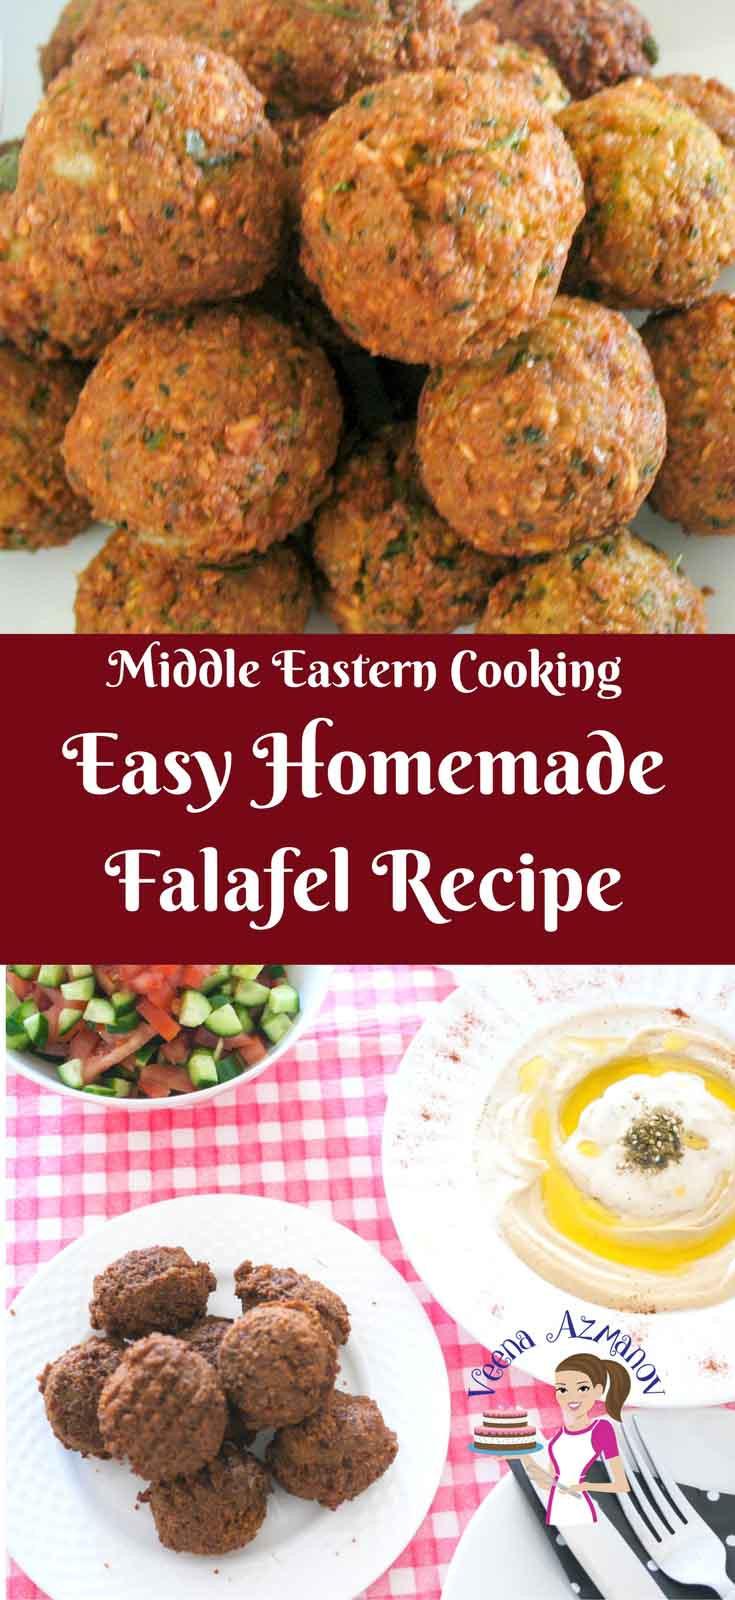 Middle Eastern Recipes Easy  Homemade Falafel Recipe Israeli Falafel Recipe Veena